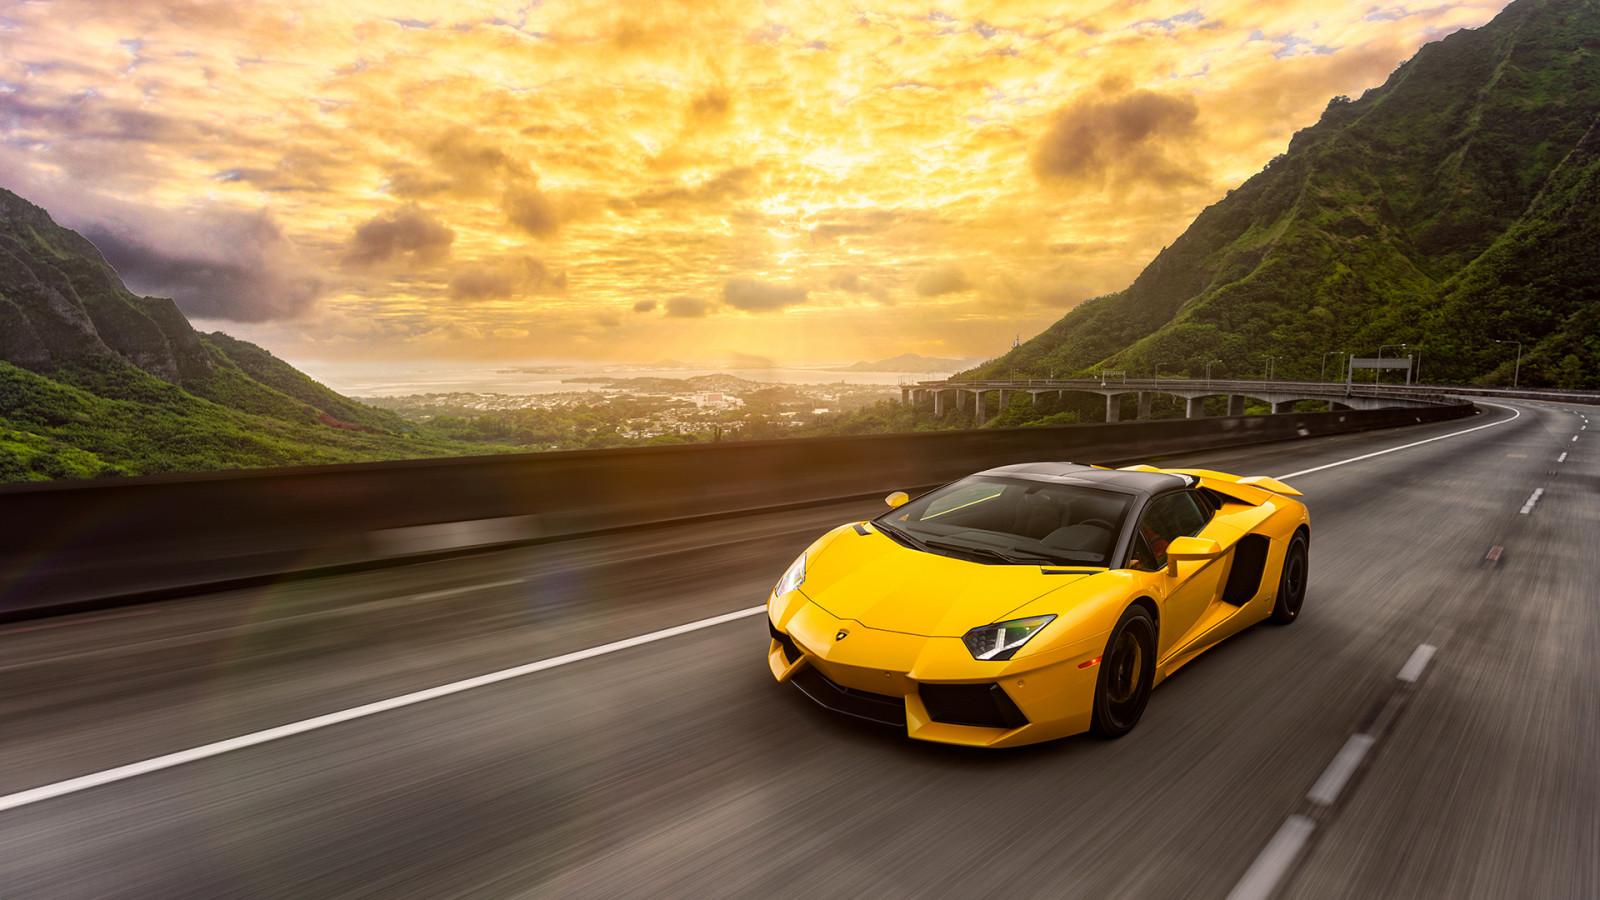 Wallpaper Mobil Sport Lamborghini Hd